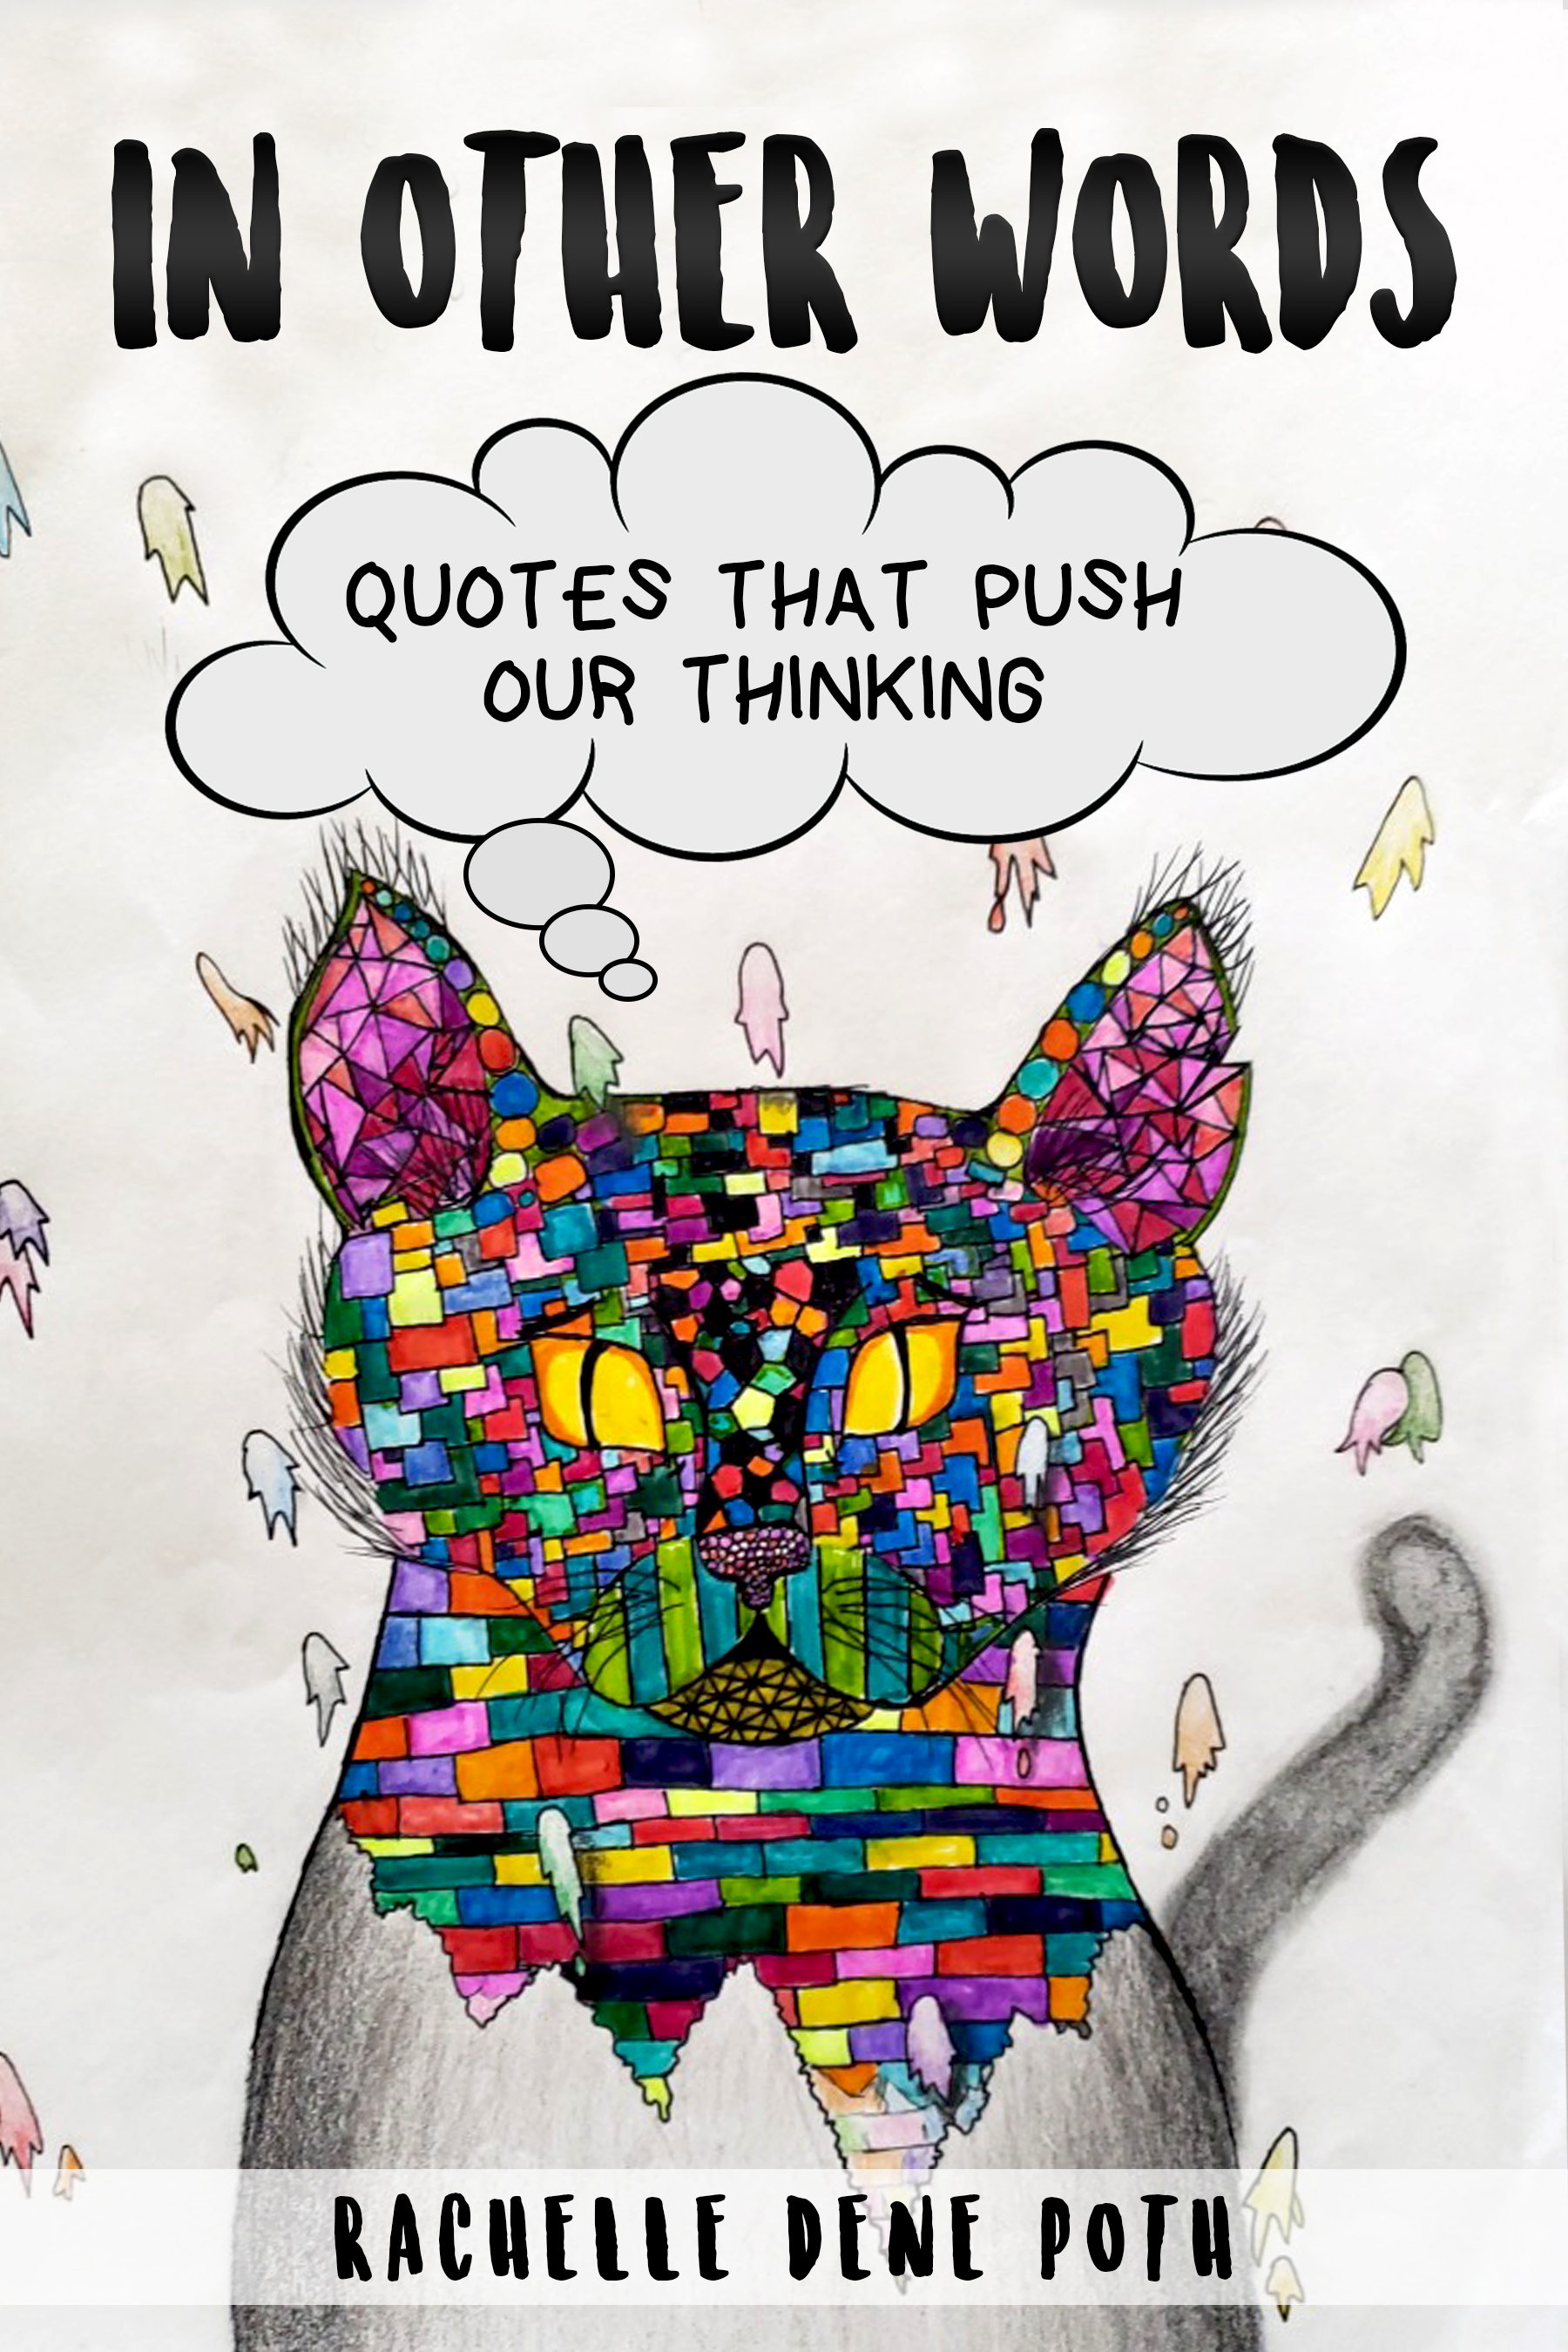 In Other Words by Rachelle Dene Poth